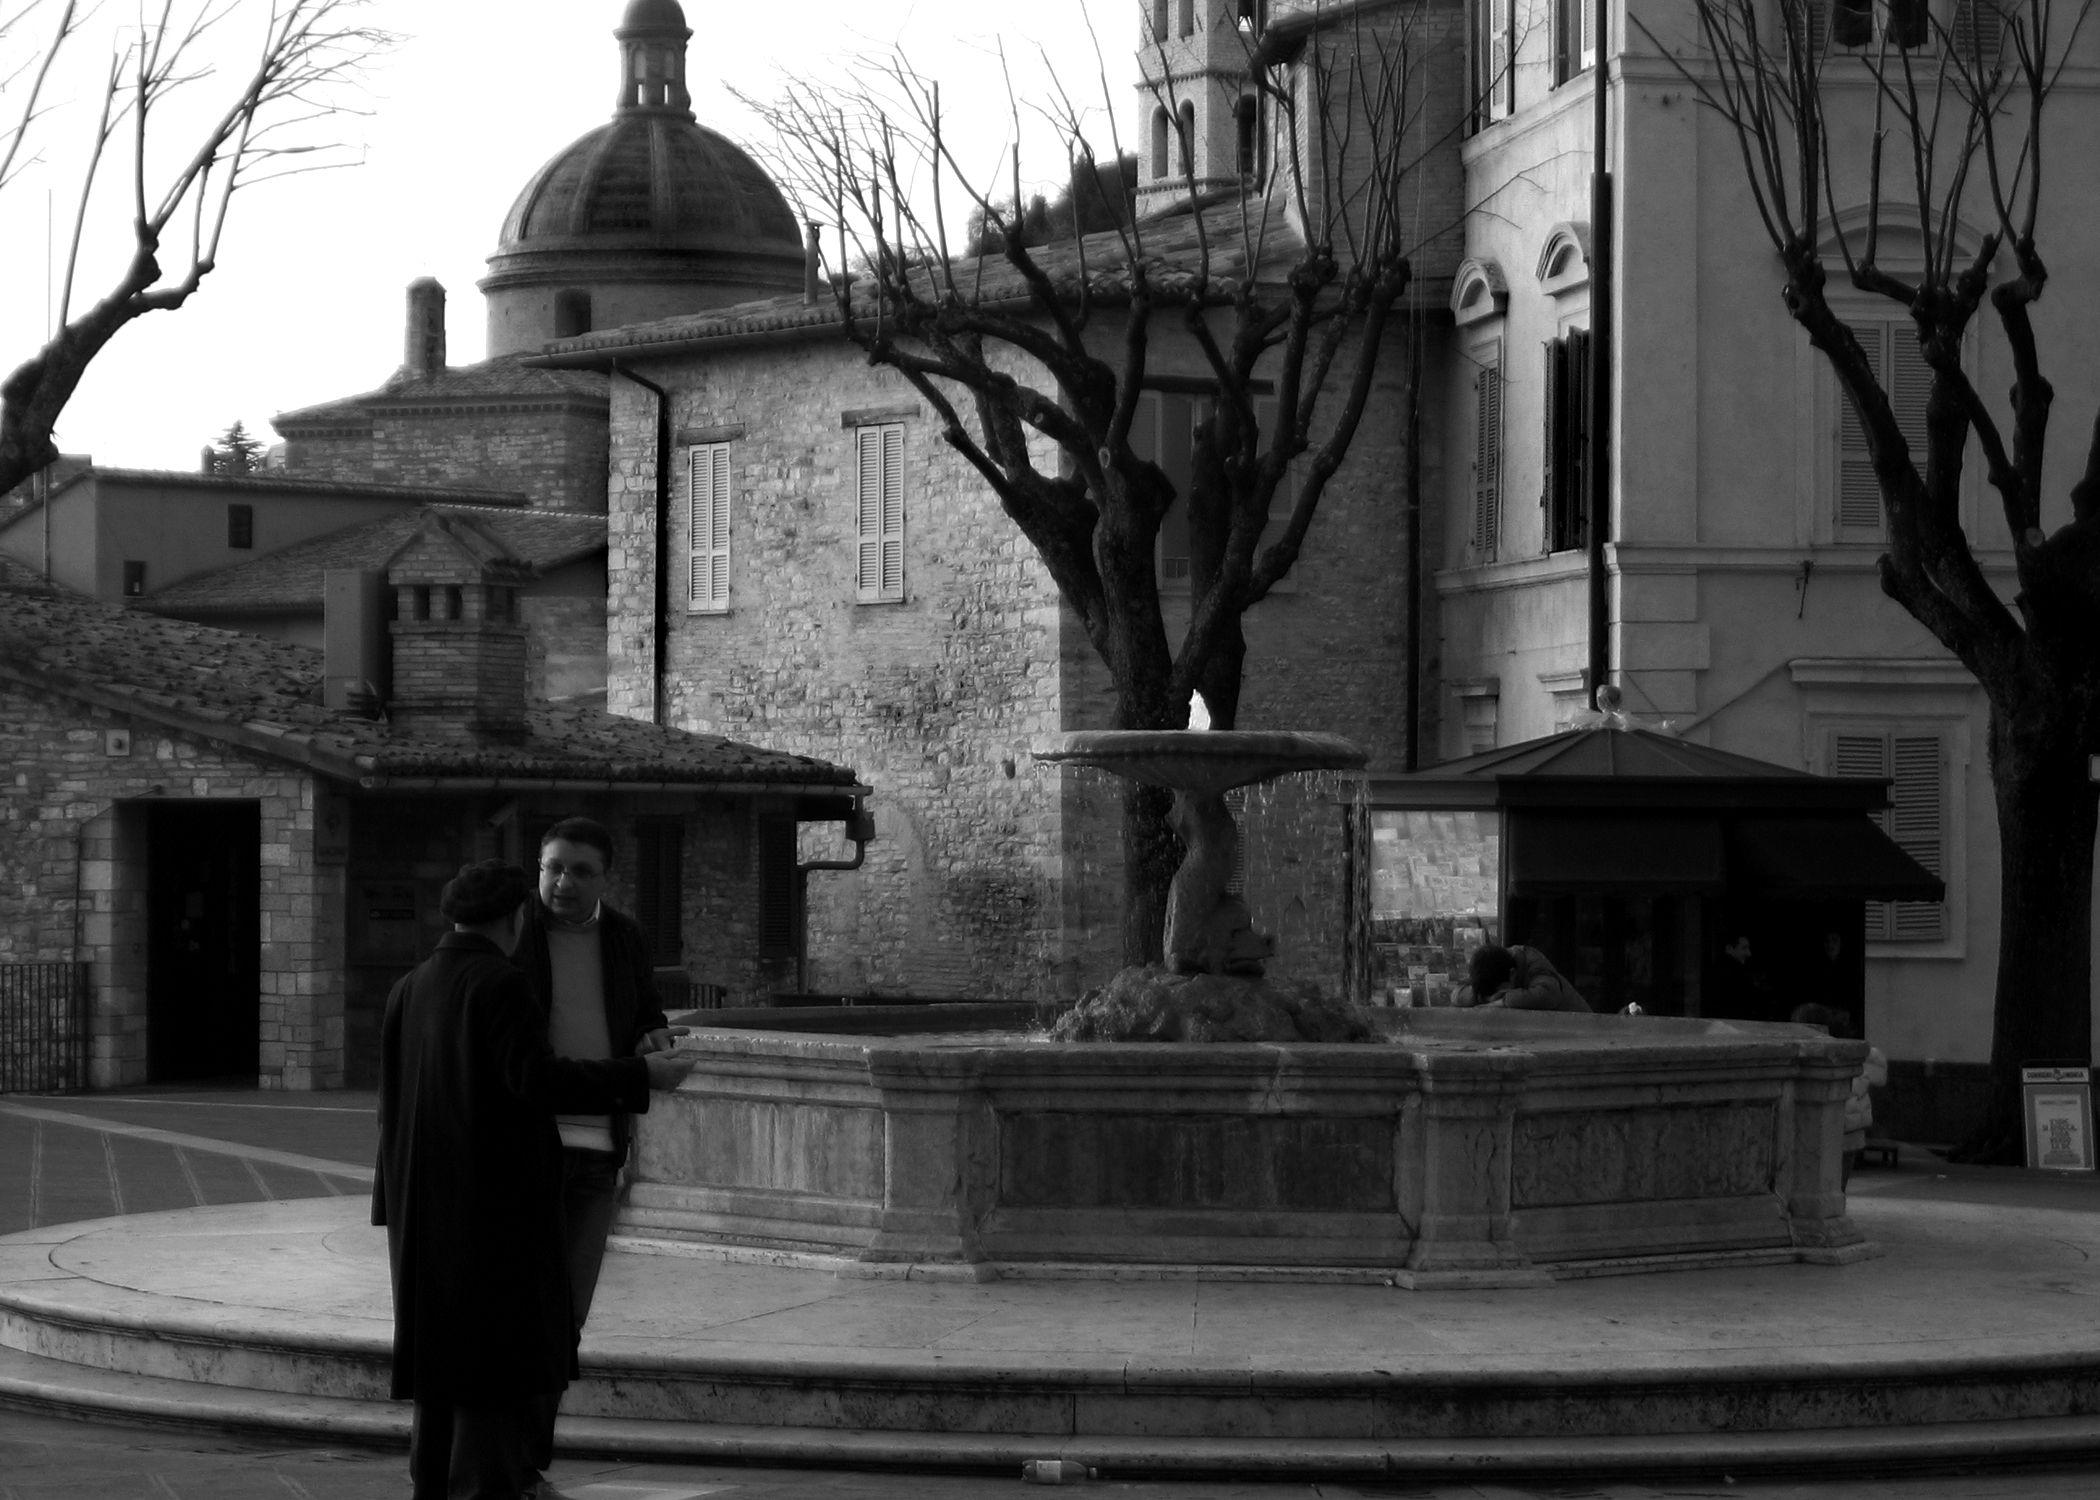 Unseen Tourist Spot. Assisi, Italy